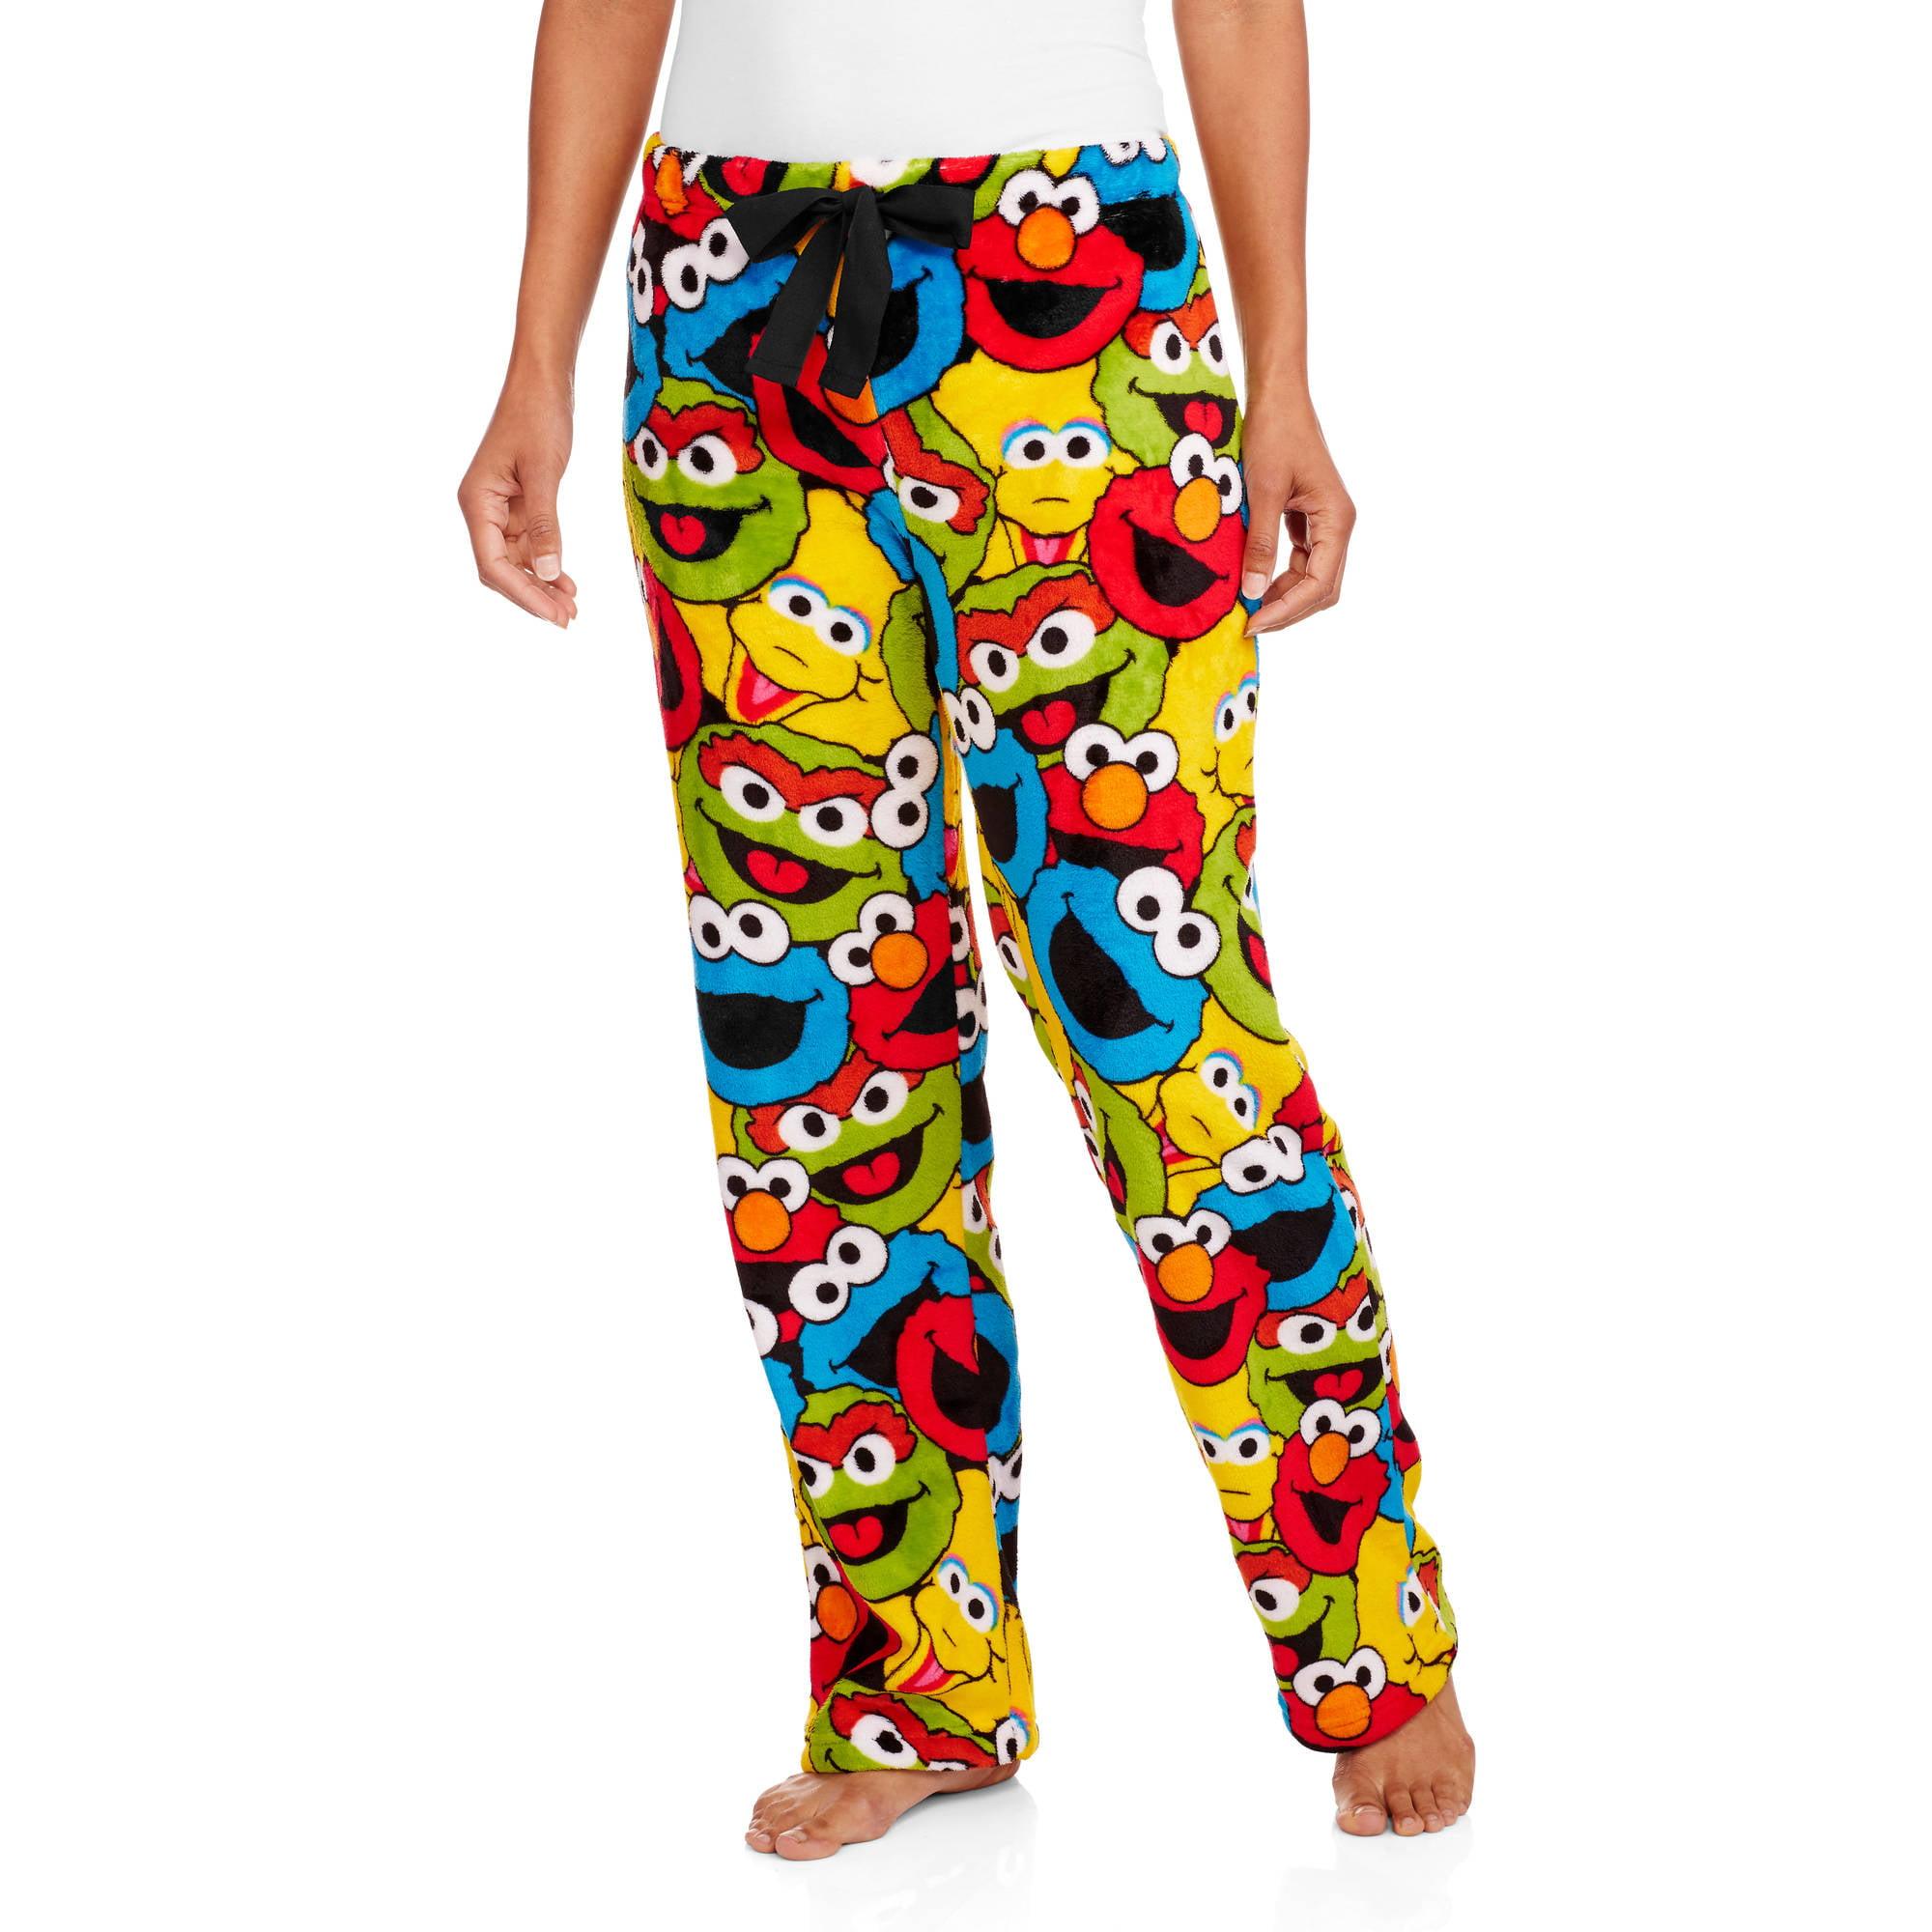 d0d560b2ef Women s Licensed Pajama Super Minky Plush Fleece Sleep Pants ...